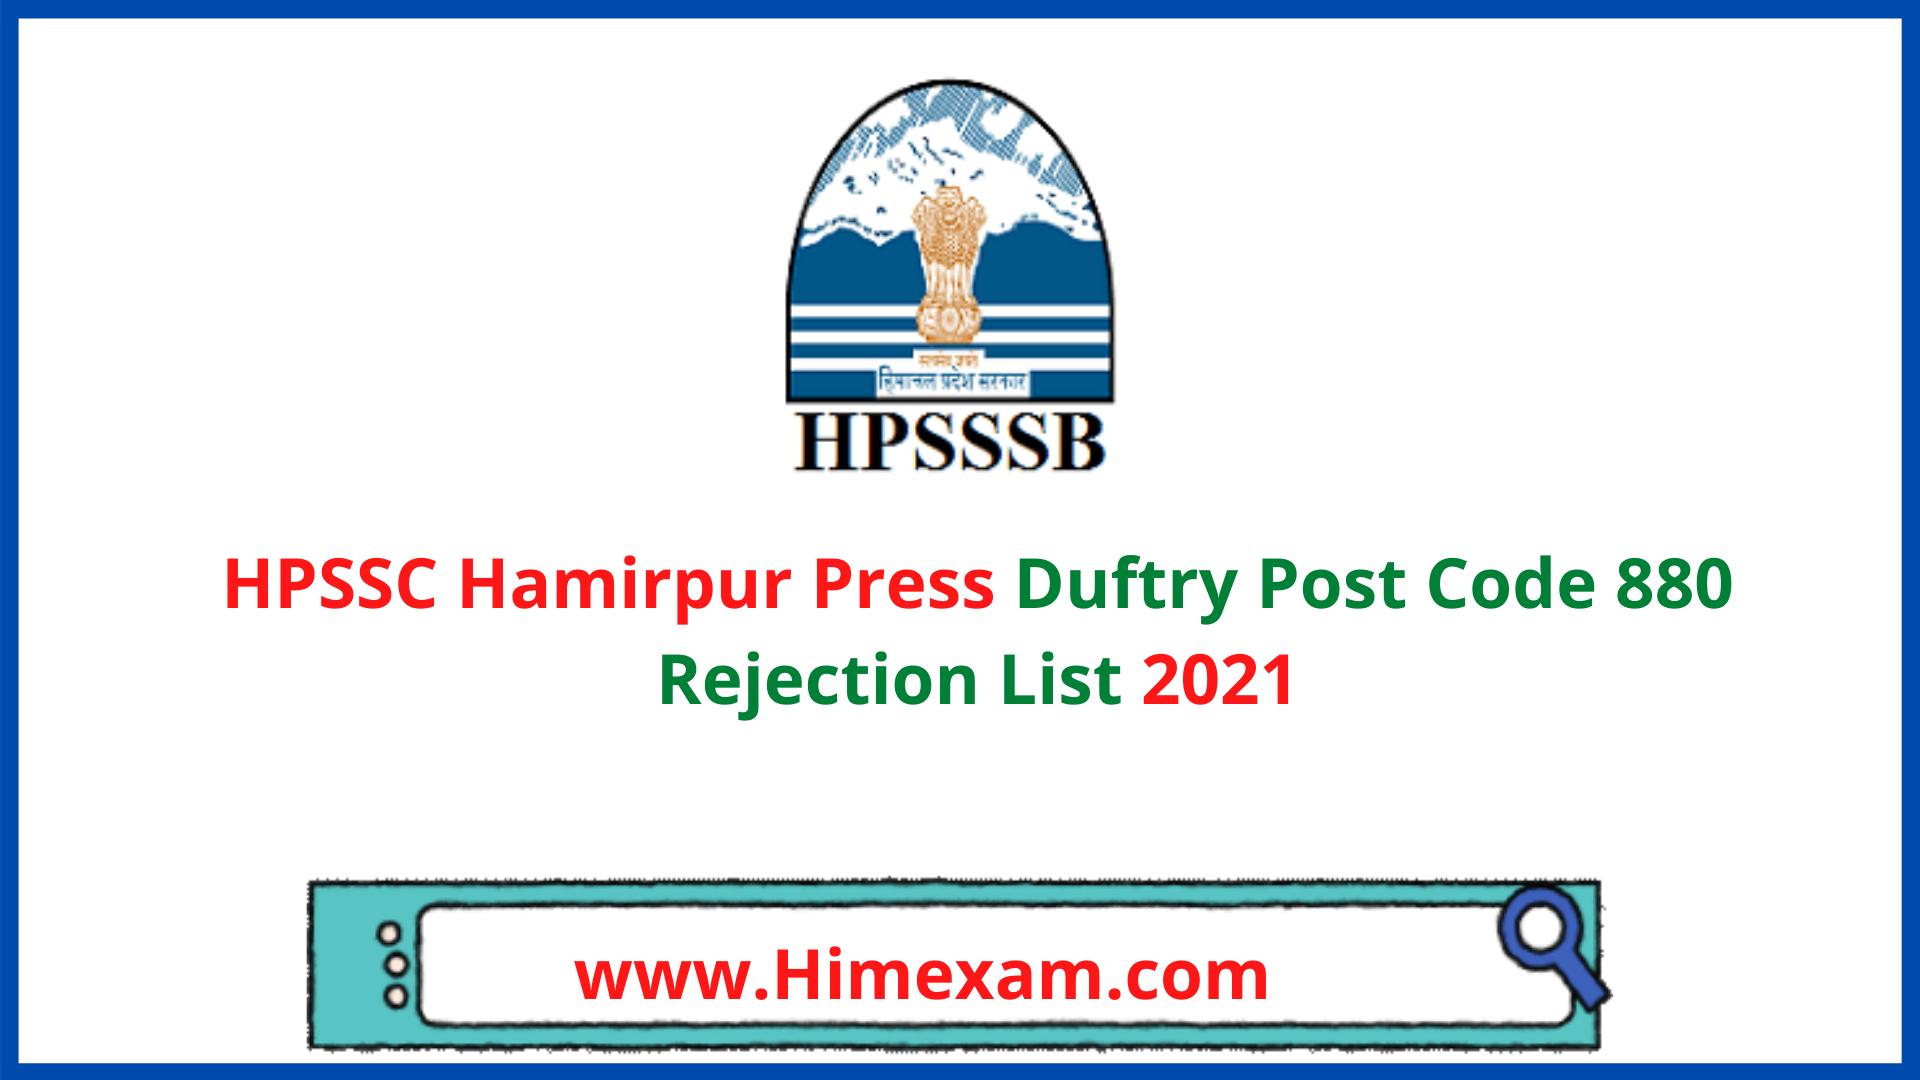 HPSSC Hamirpur Press Duftry Post Code 880 Rejection List 2021